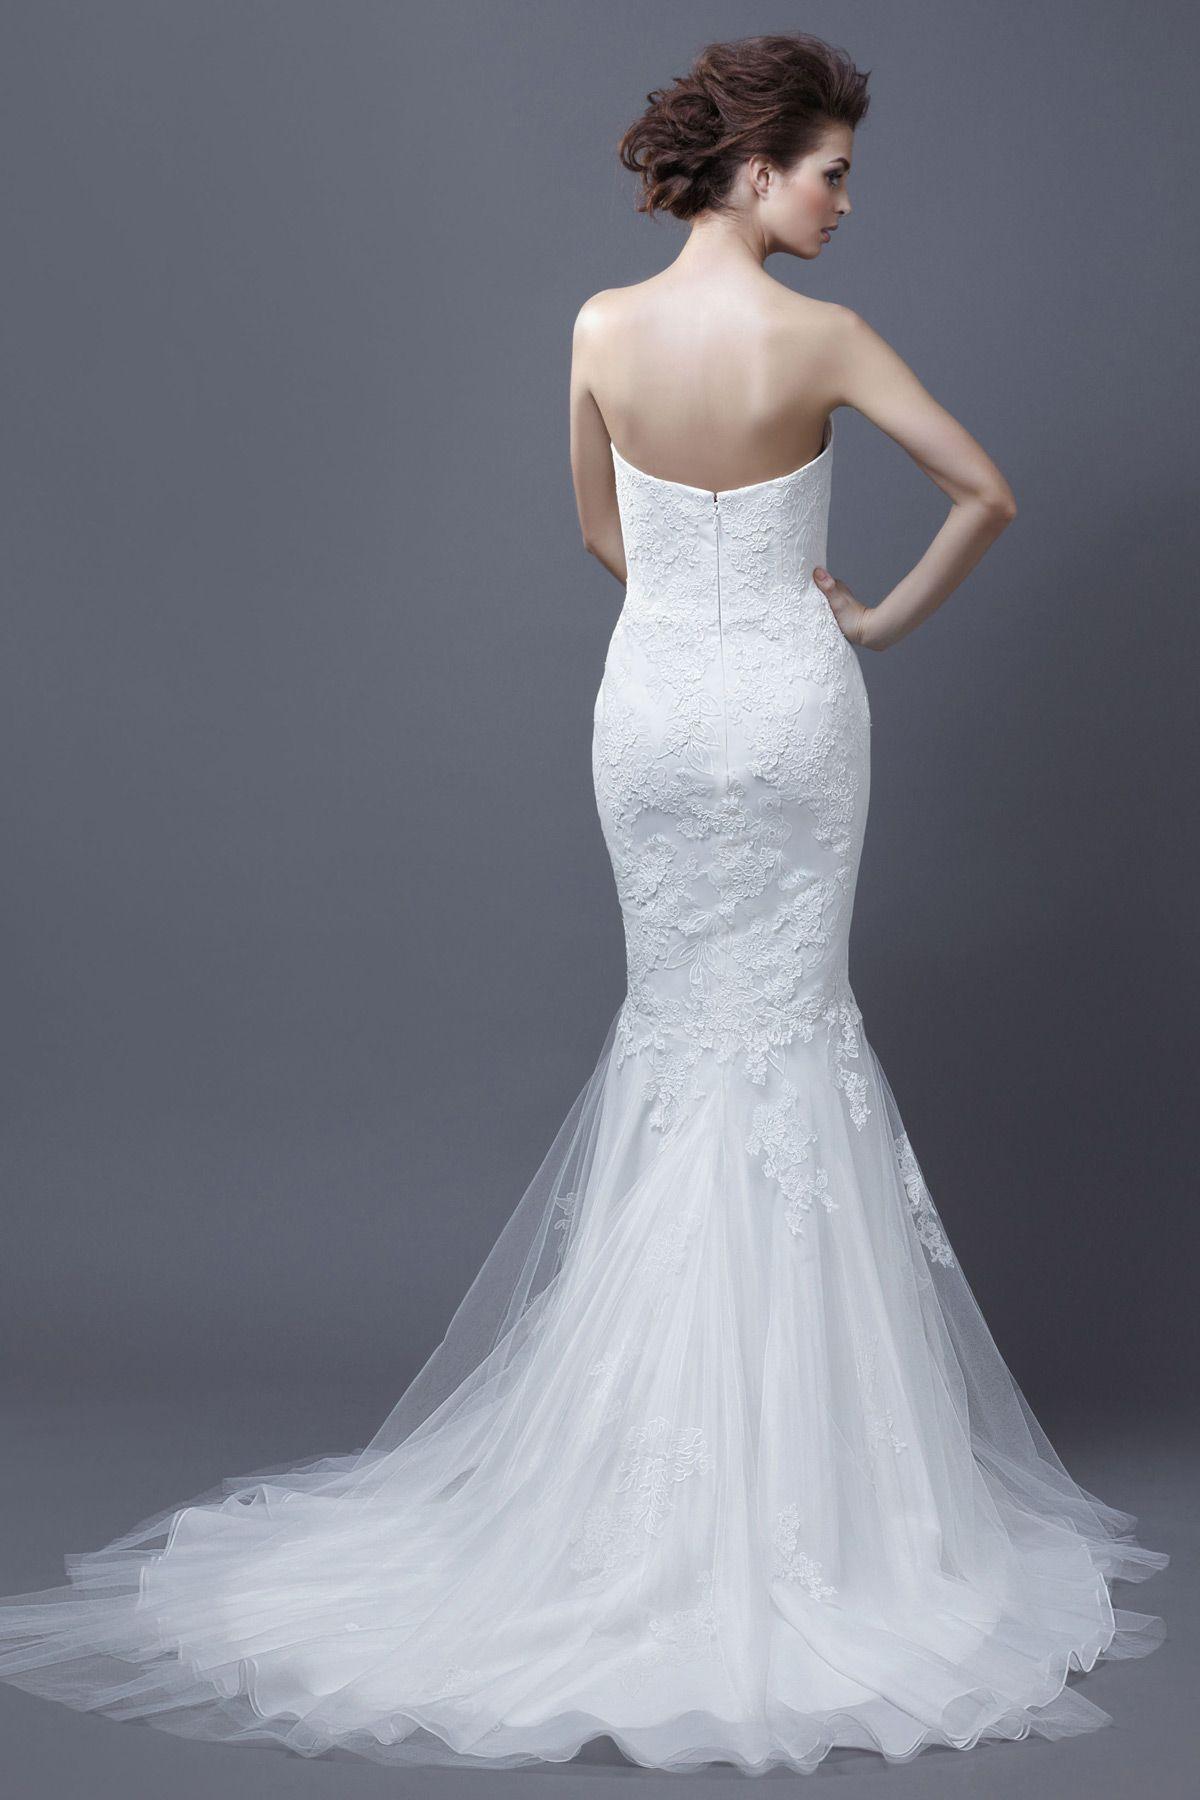 Enzoani Halia Back   one fine day...   Pinterest   Wedding dress and ...